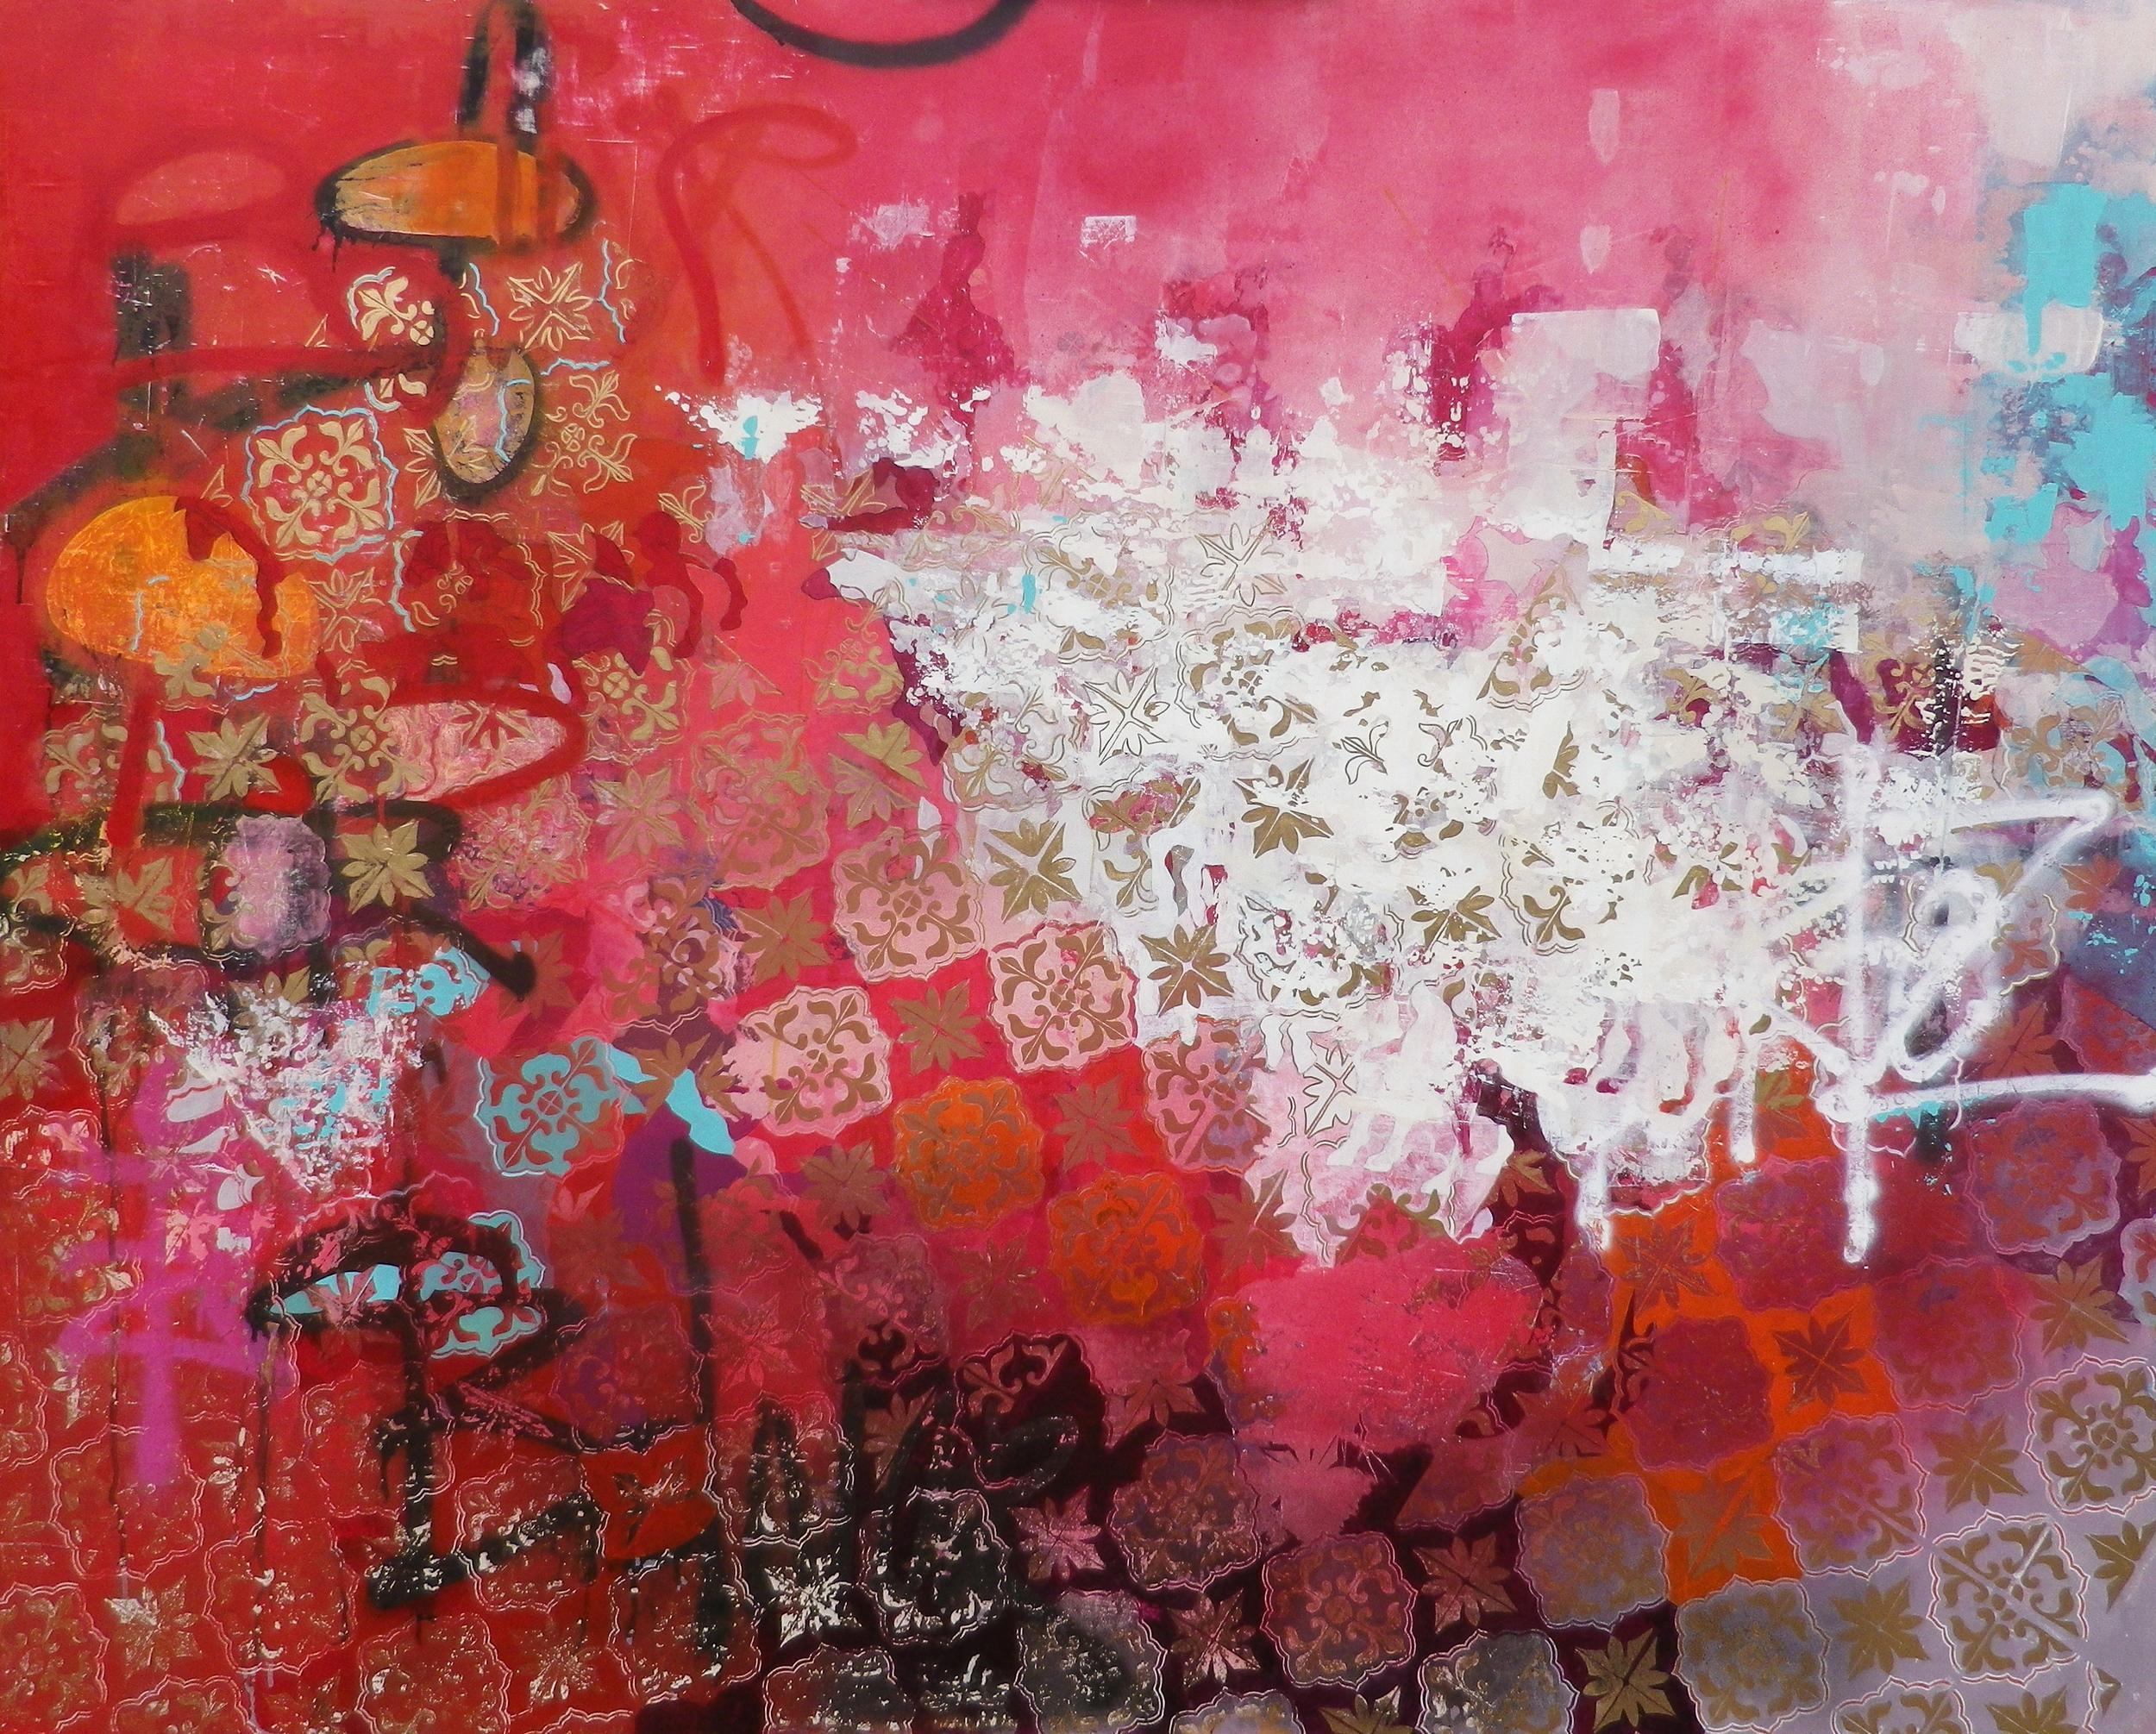 Crystal Latimer, They crave gold like hungry swine, 2015, acrylic, spray paint, metallic gilding on panel 4' x 5'